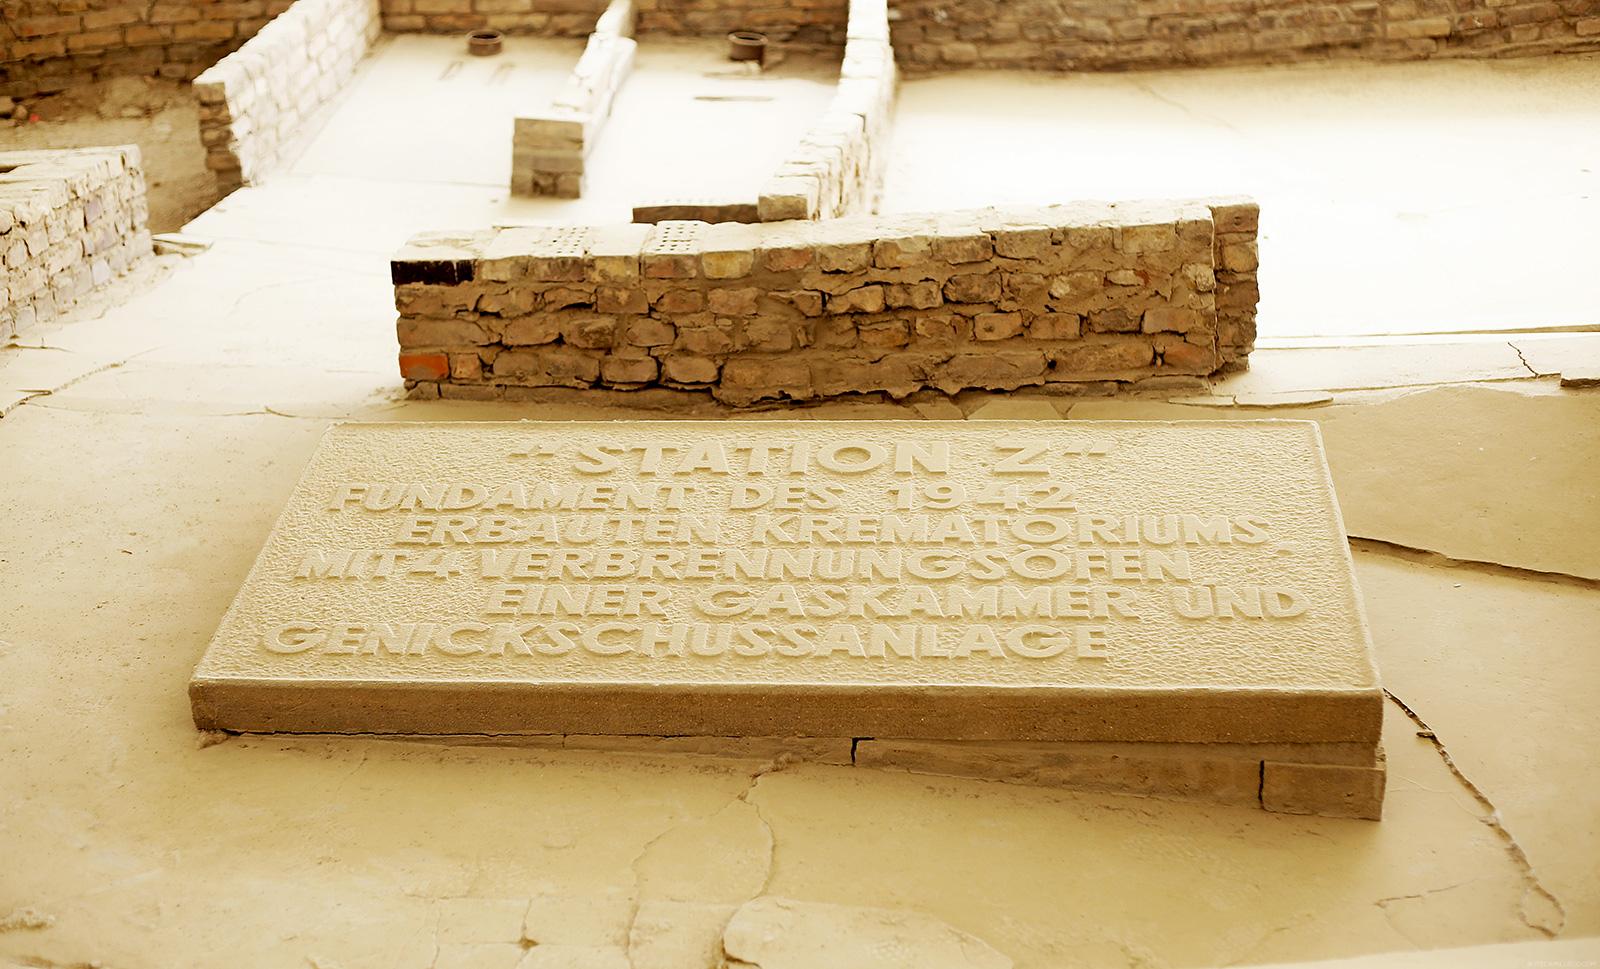 Sachsenhausen Concentration Camp | Camille Tries To Blog: http://itscamilleco.com/2014/08/travel-diary-sachsenhausen/